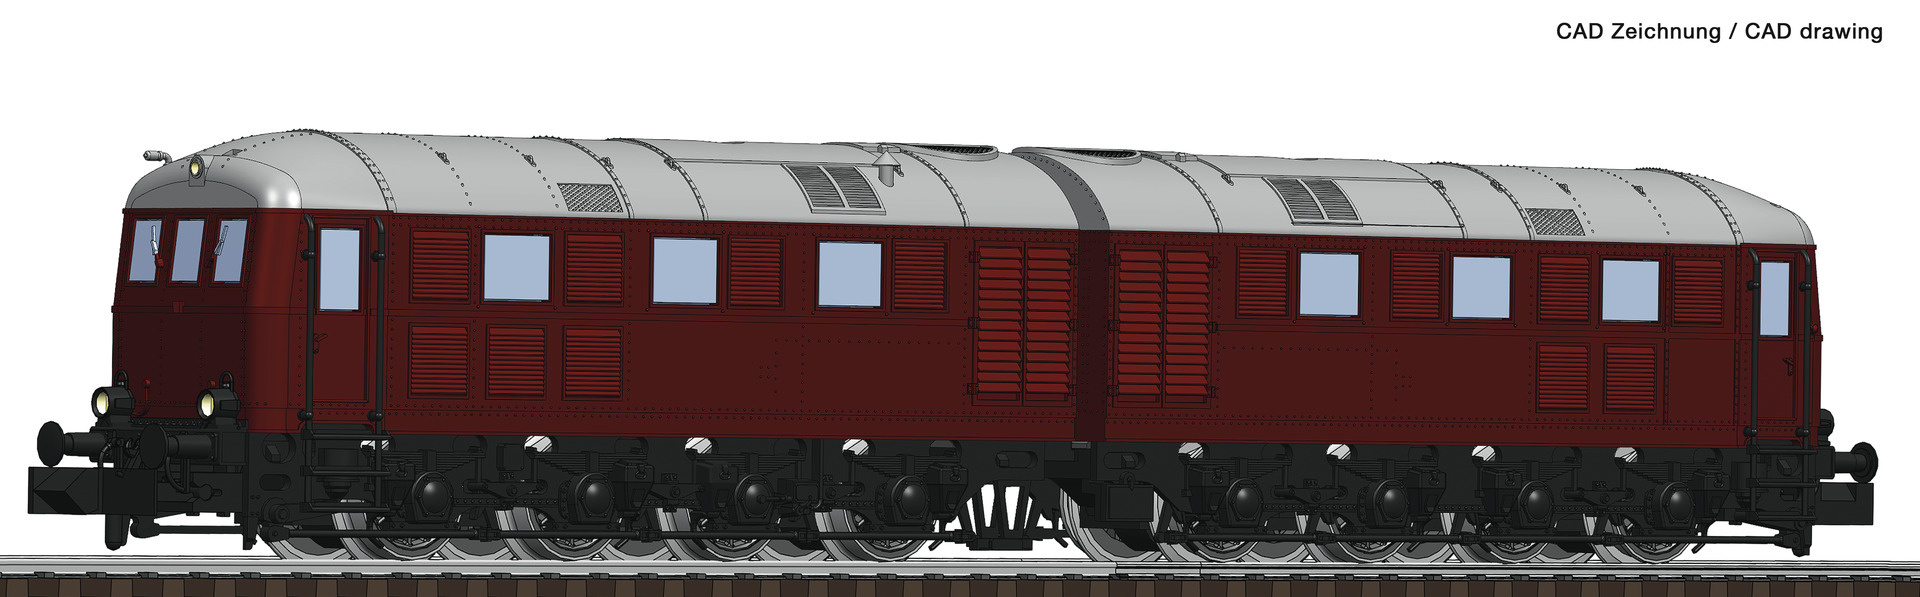 725100 Doppel-Diesellok BR288 rt.-1